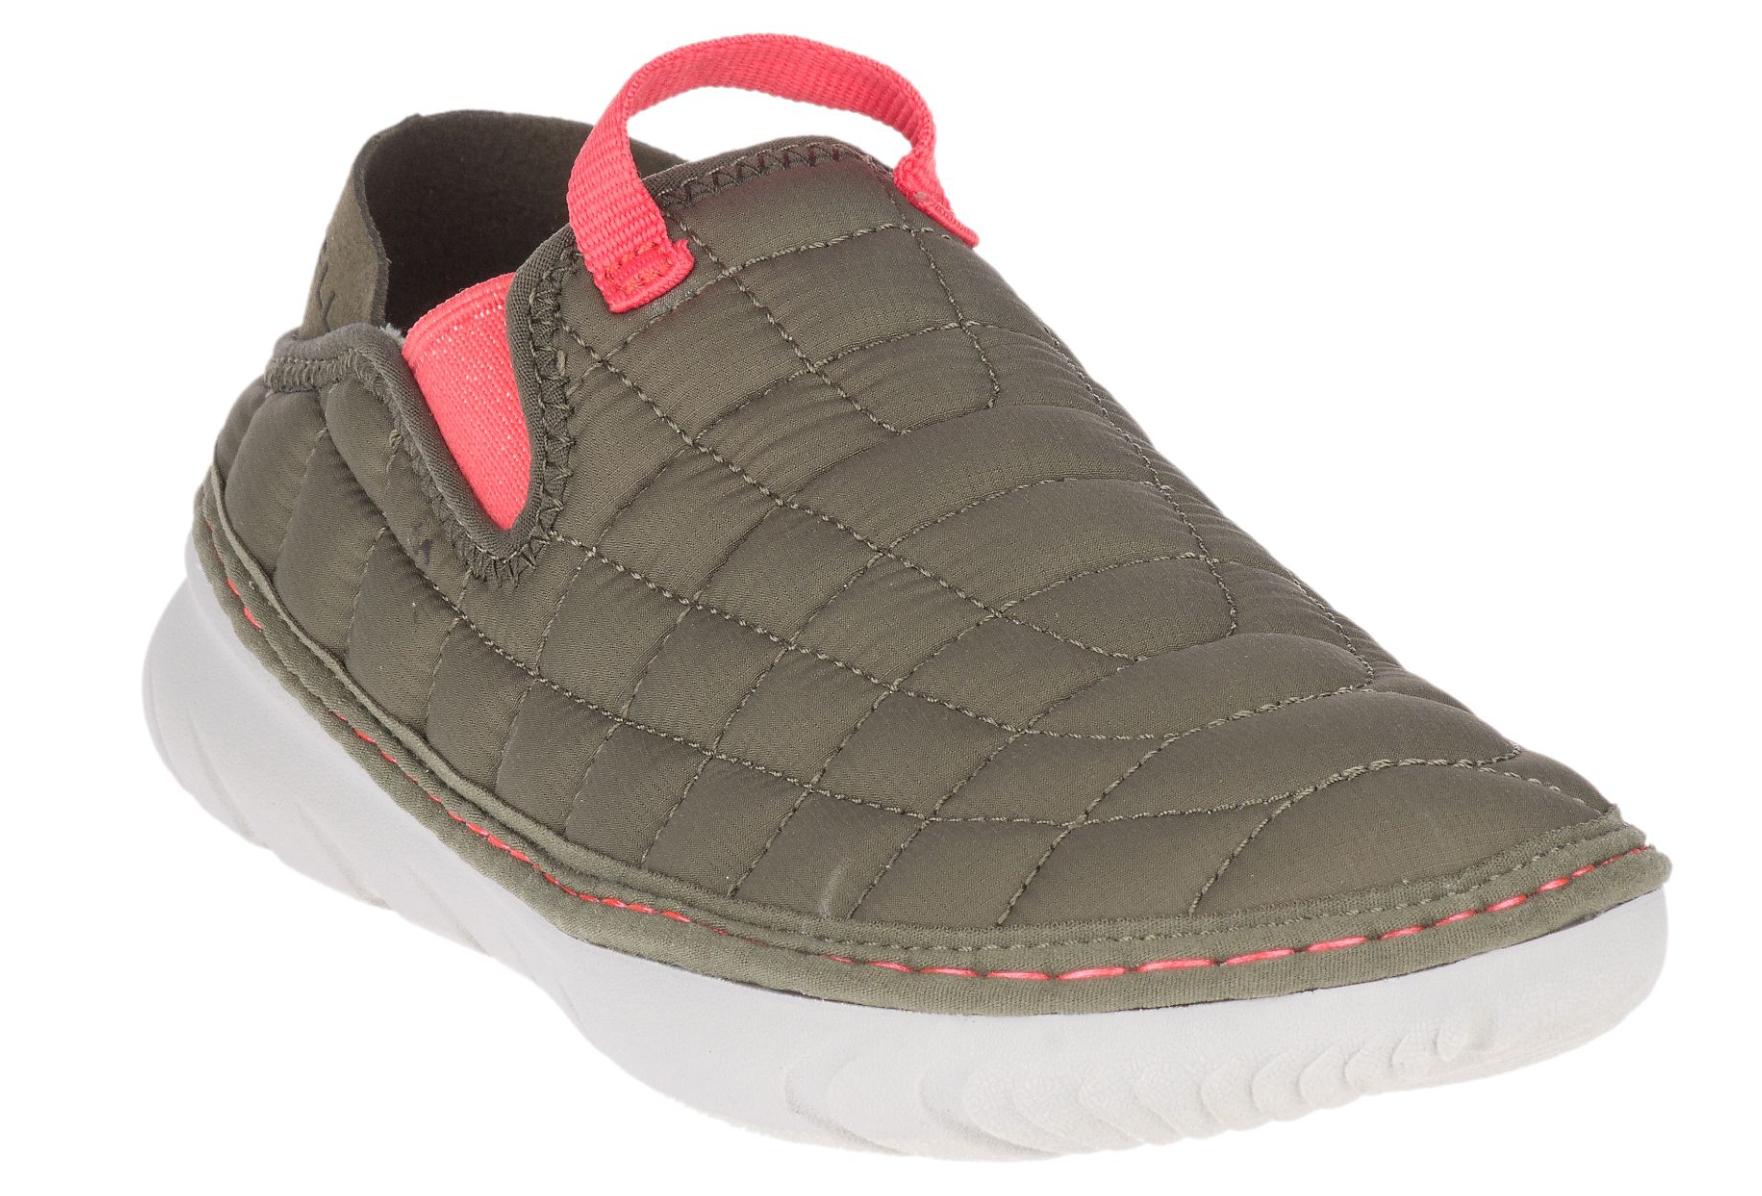 Merrell Hut Moc Shoe